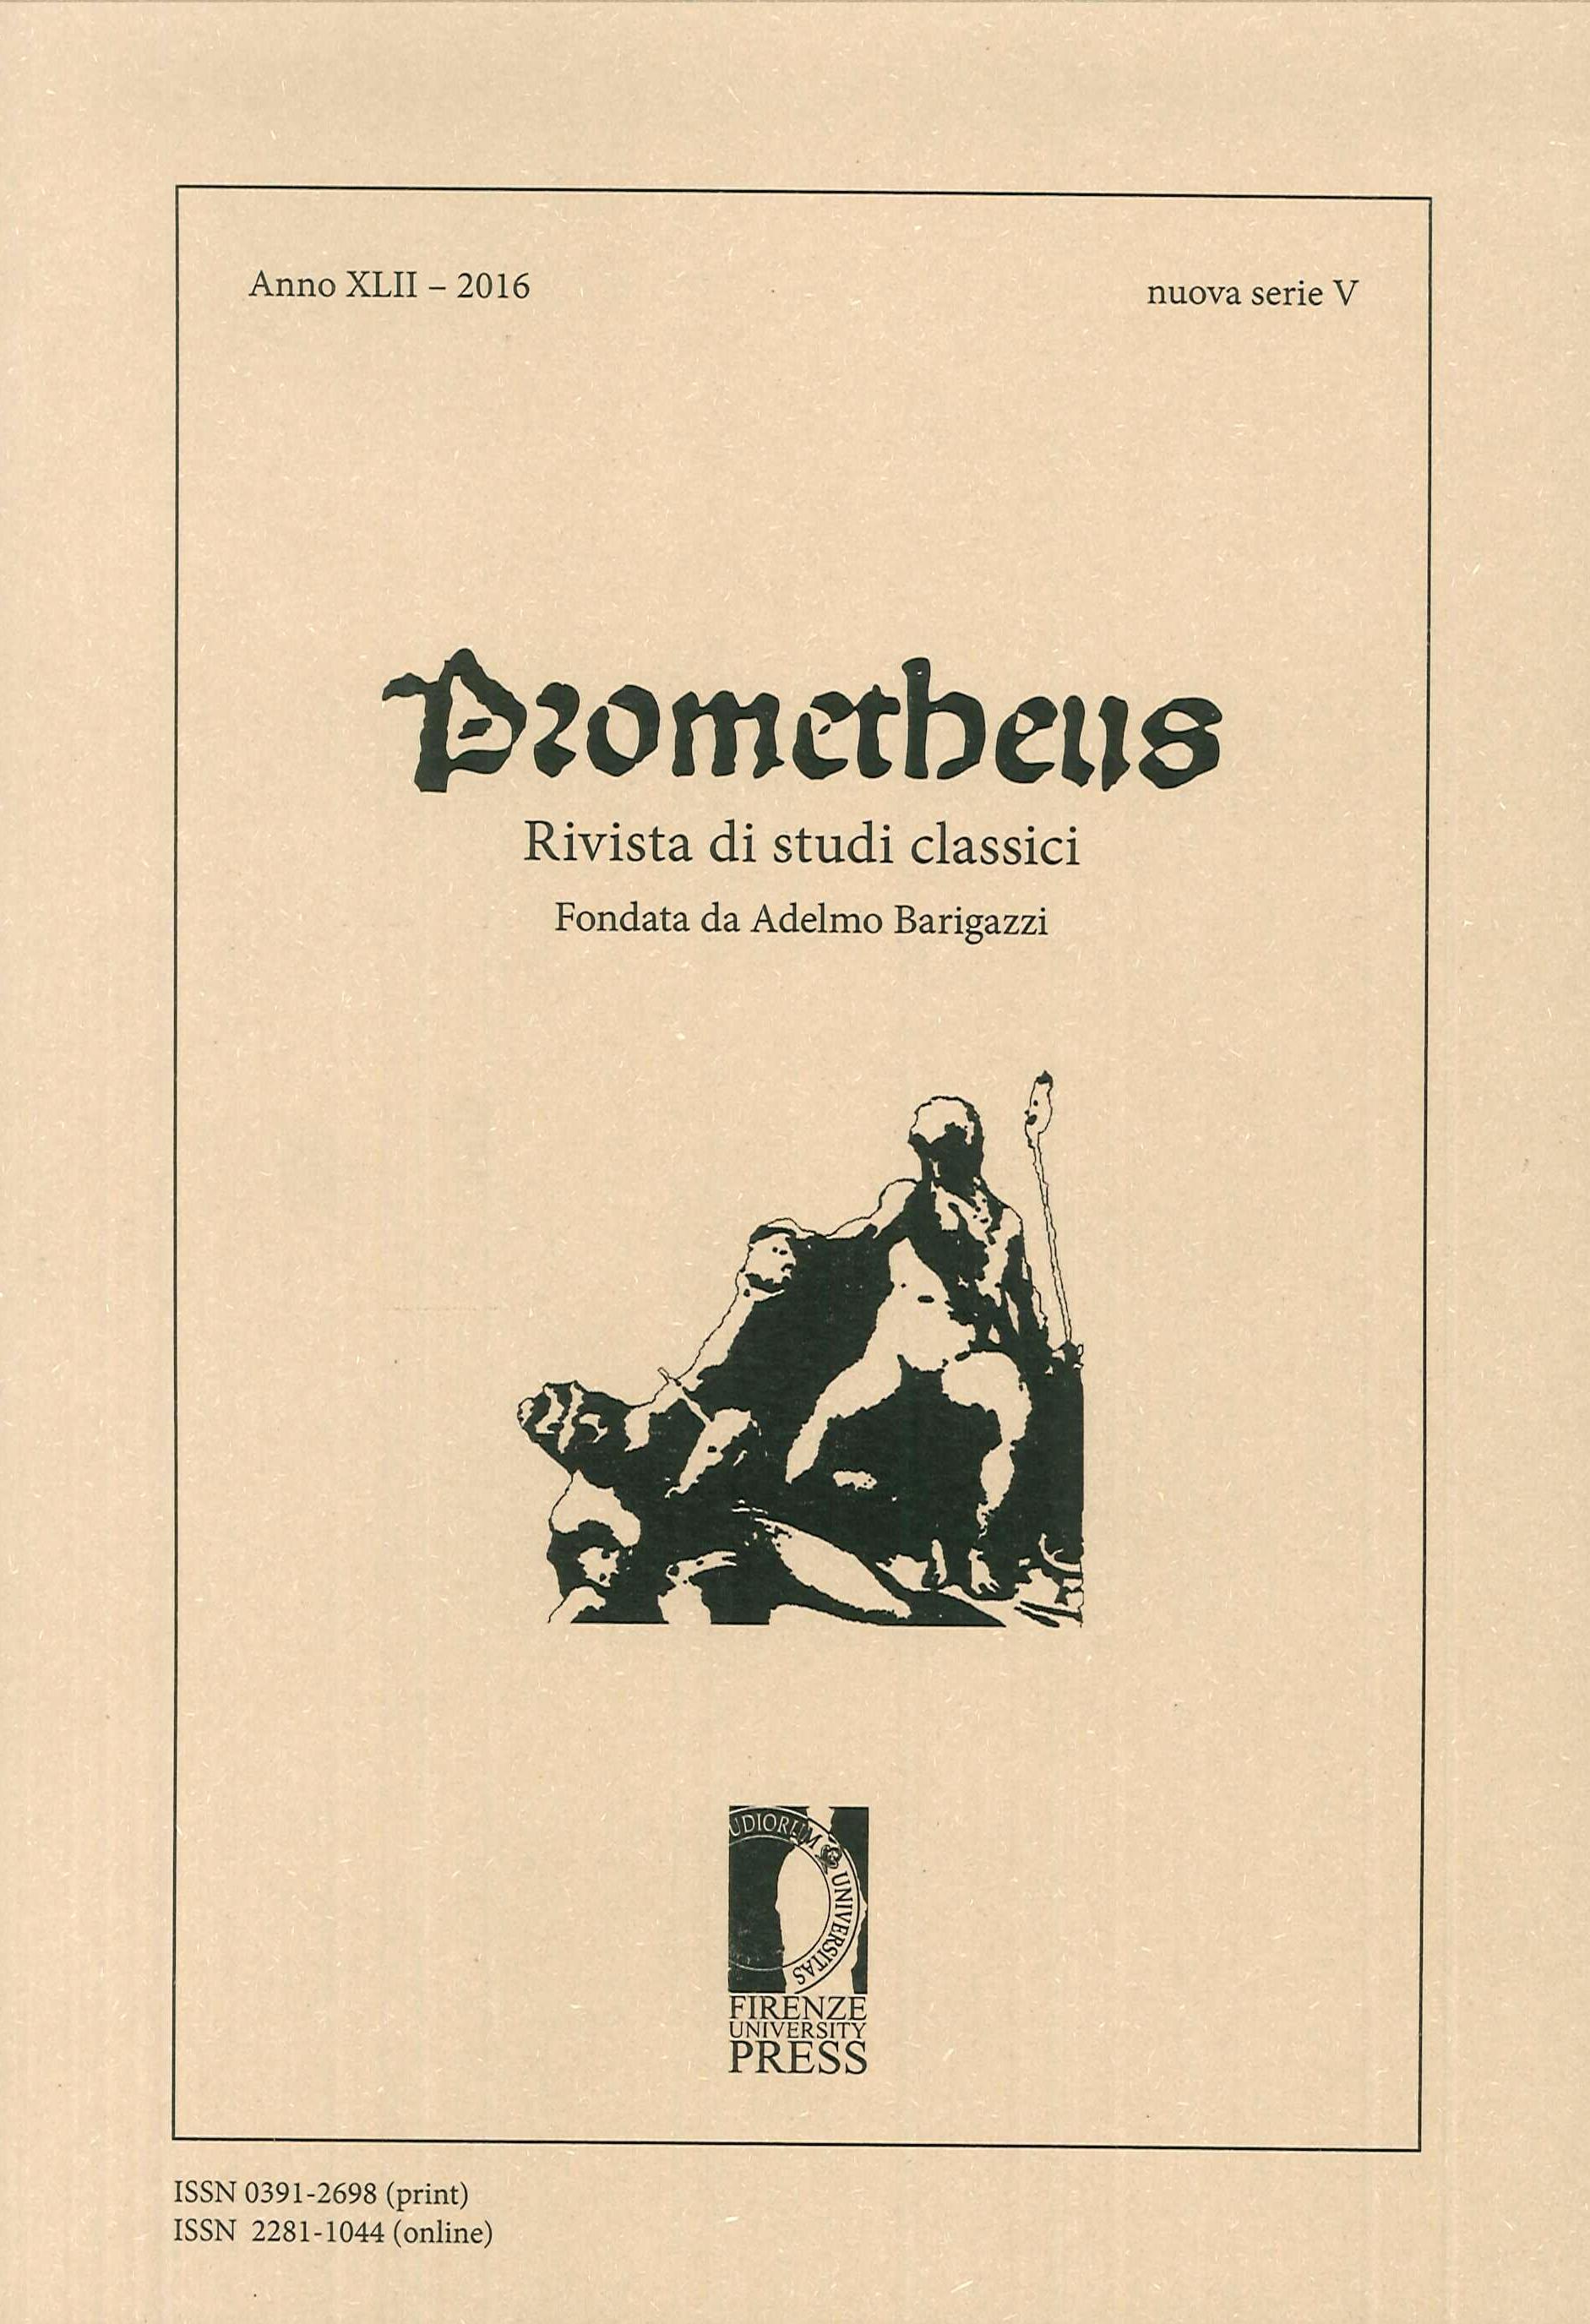 Prometheus. Rivista di studi classici. XLII - 2016.